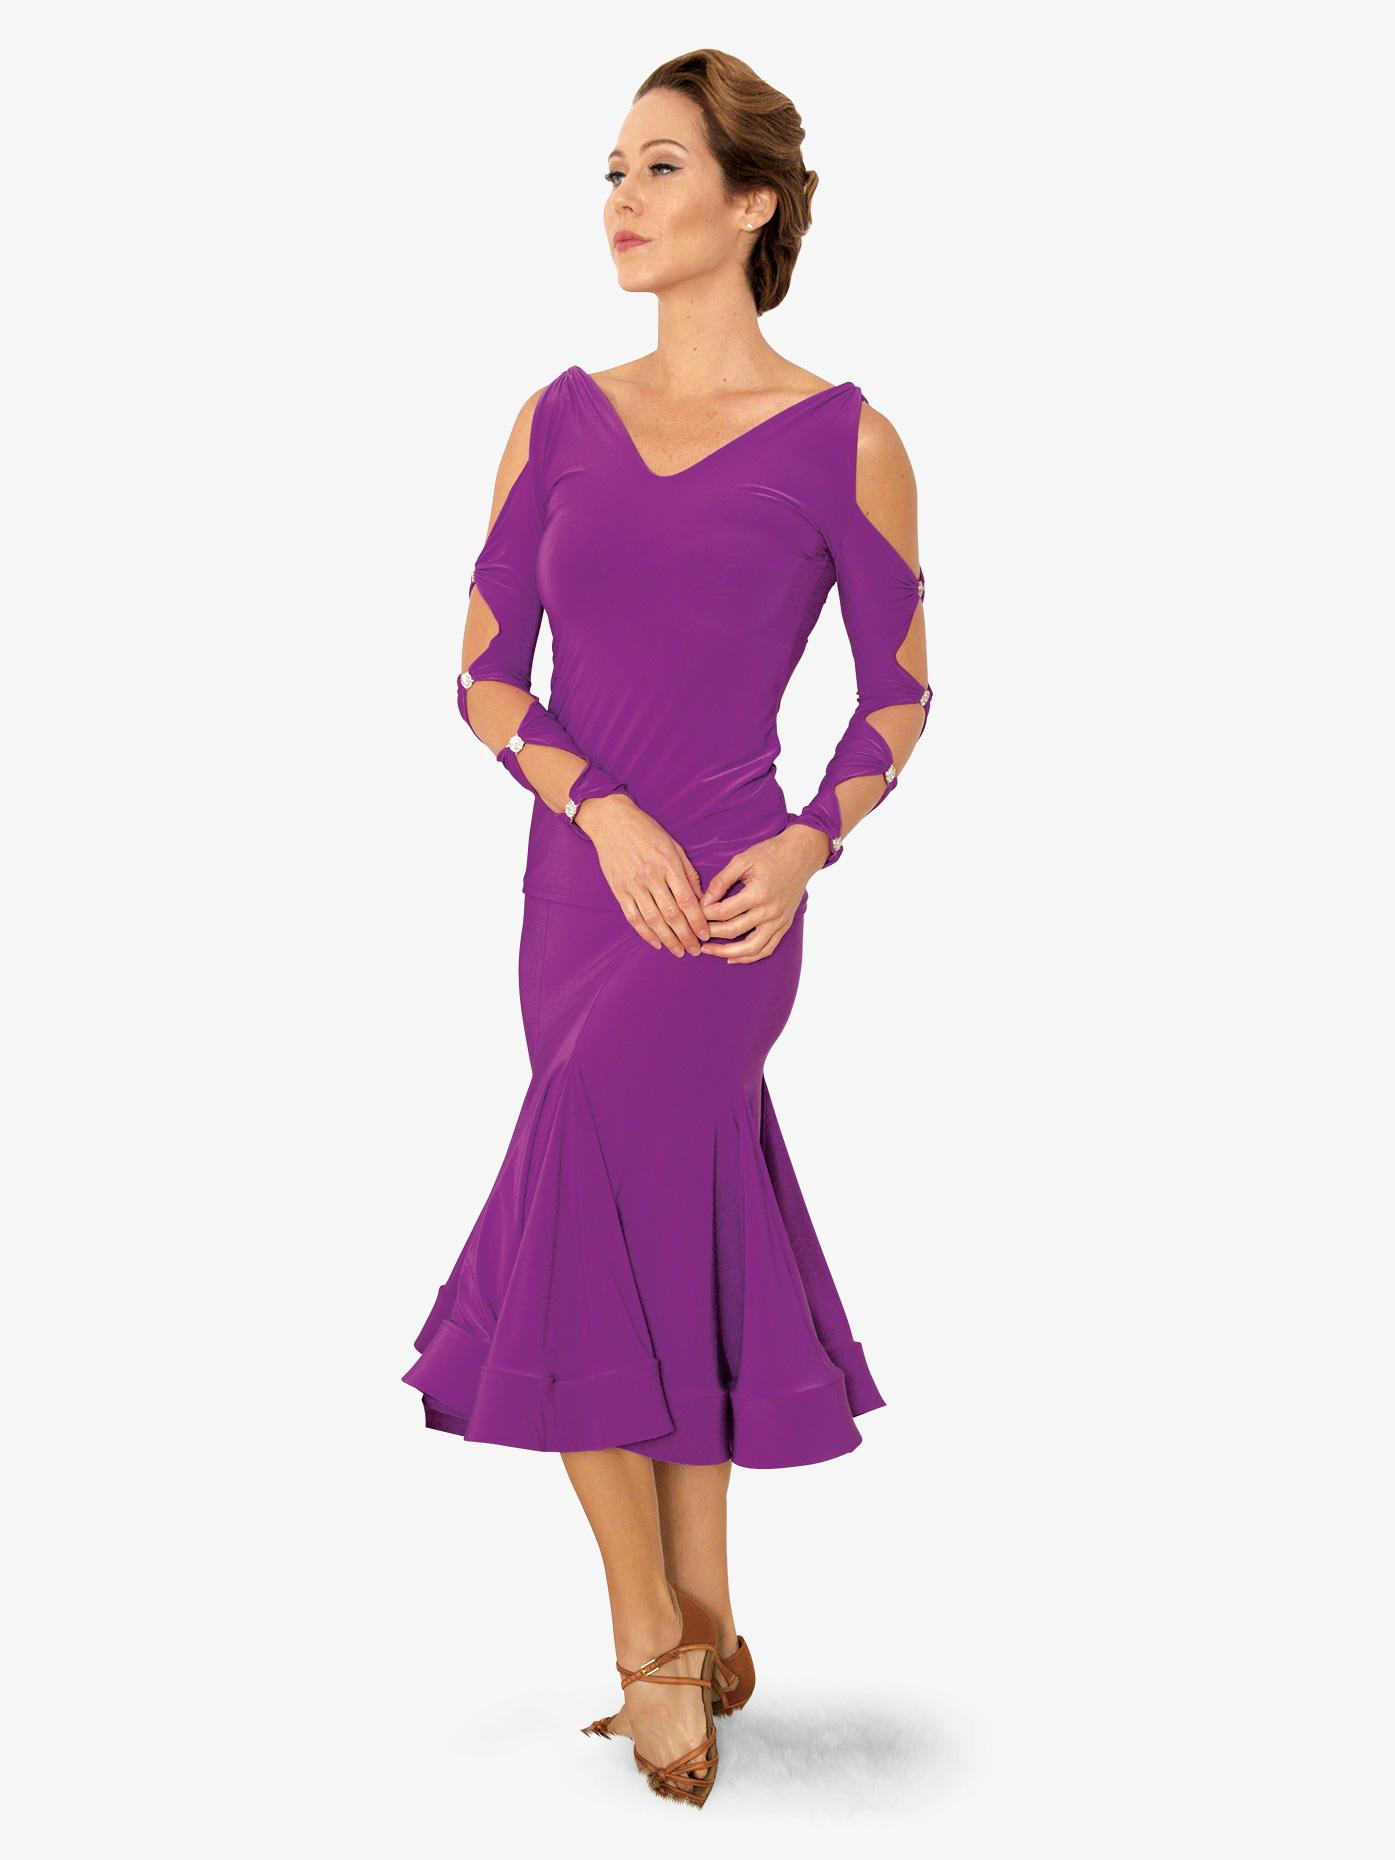 2afe92f2353 Womens Short Trumpet Ballroom Dance Skirt - Style No S822. Loading zoom